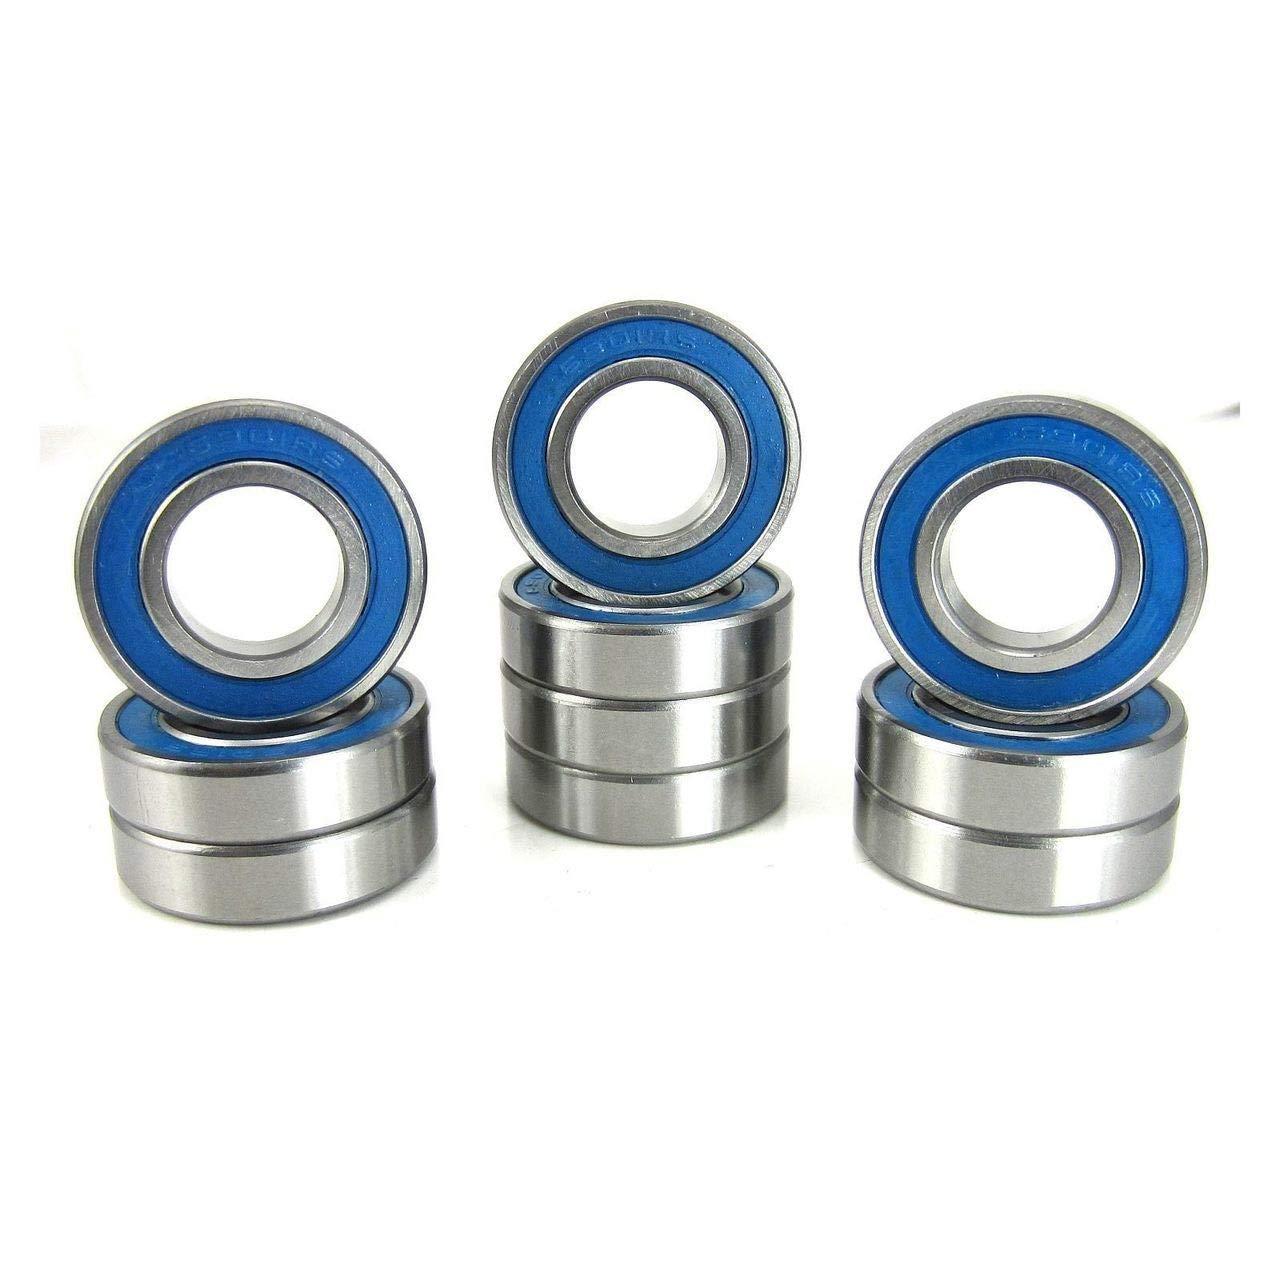 12x24x6mm Precision Ball Bearings ABEC 3 Blue Rubber Seals (10)